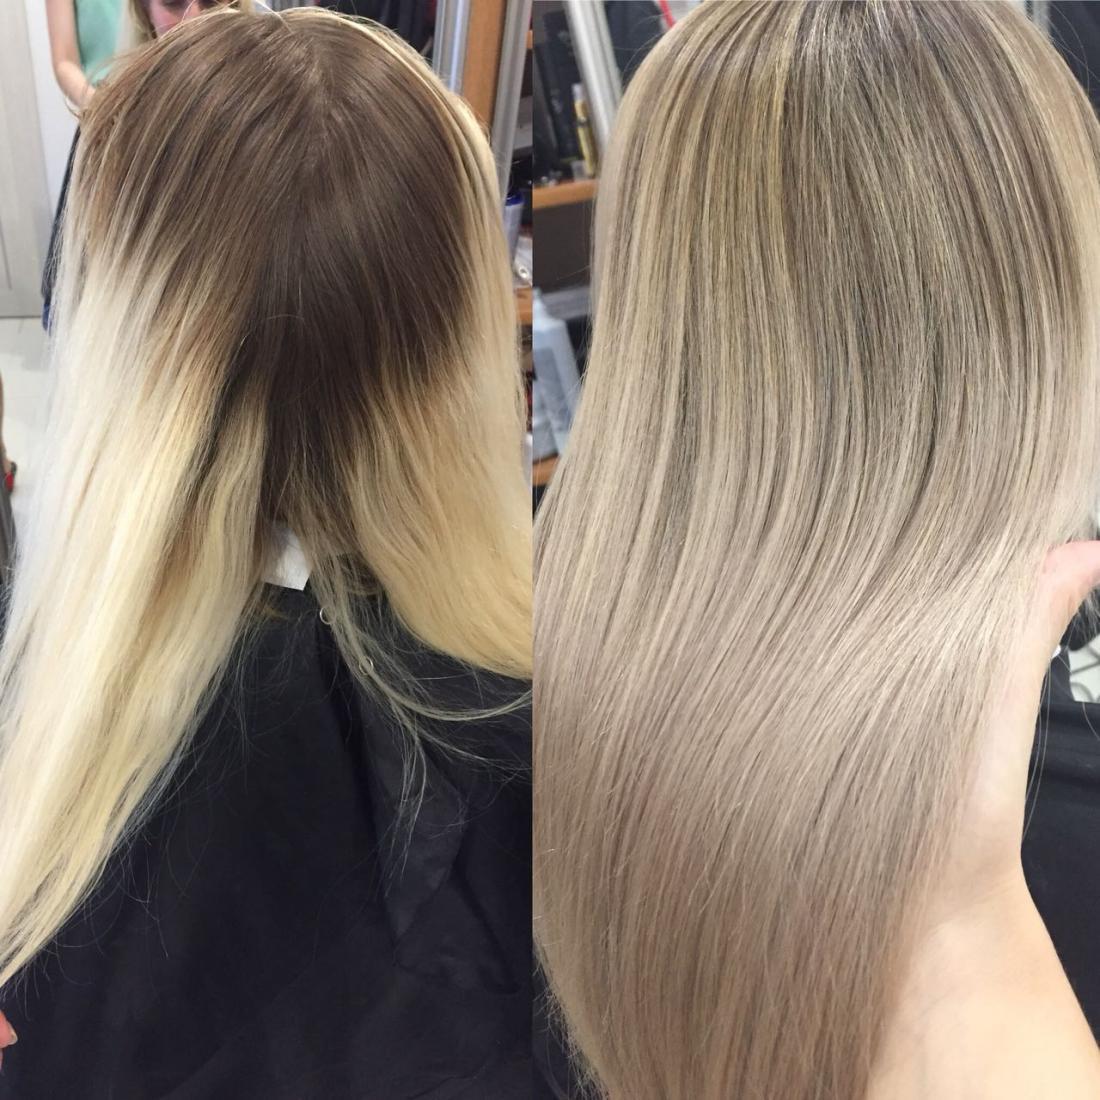 "Сложное окрашивание волос, в один тон, краской клиента + уход от 15 руб. в студии ""S beauty Kate"""